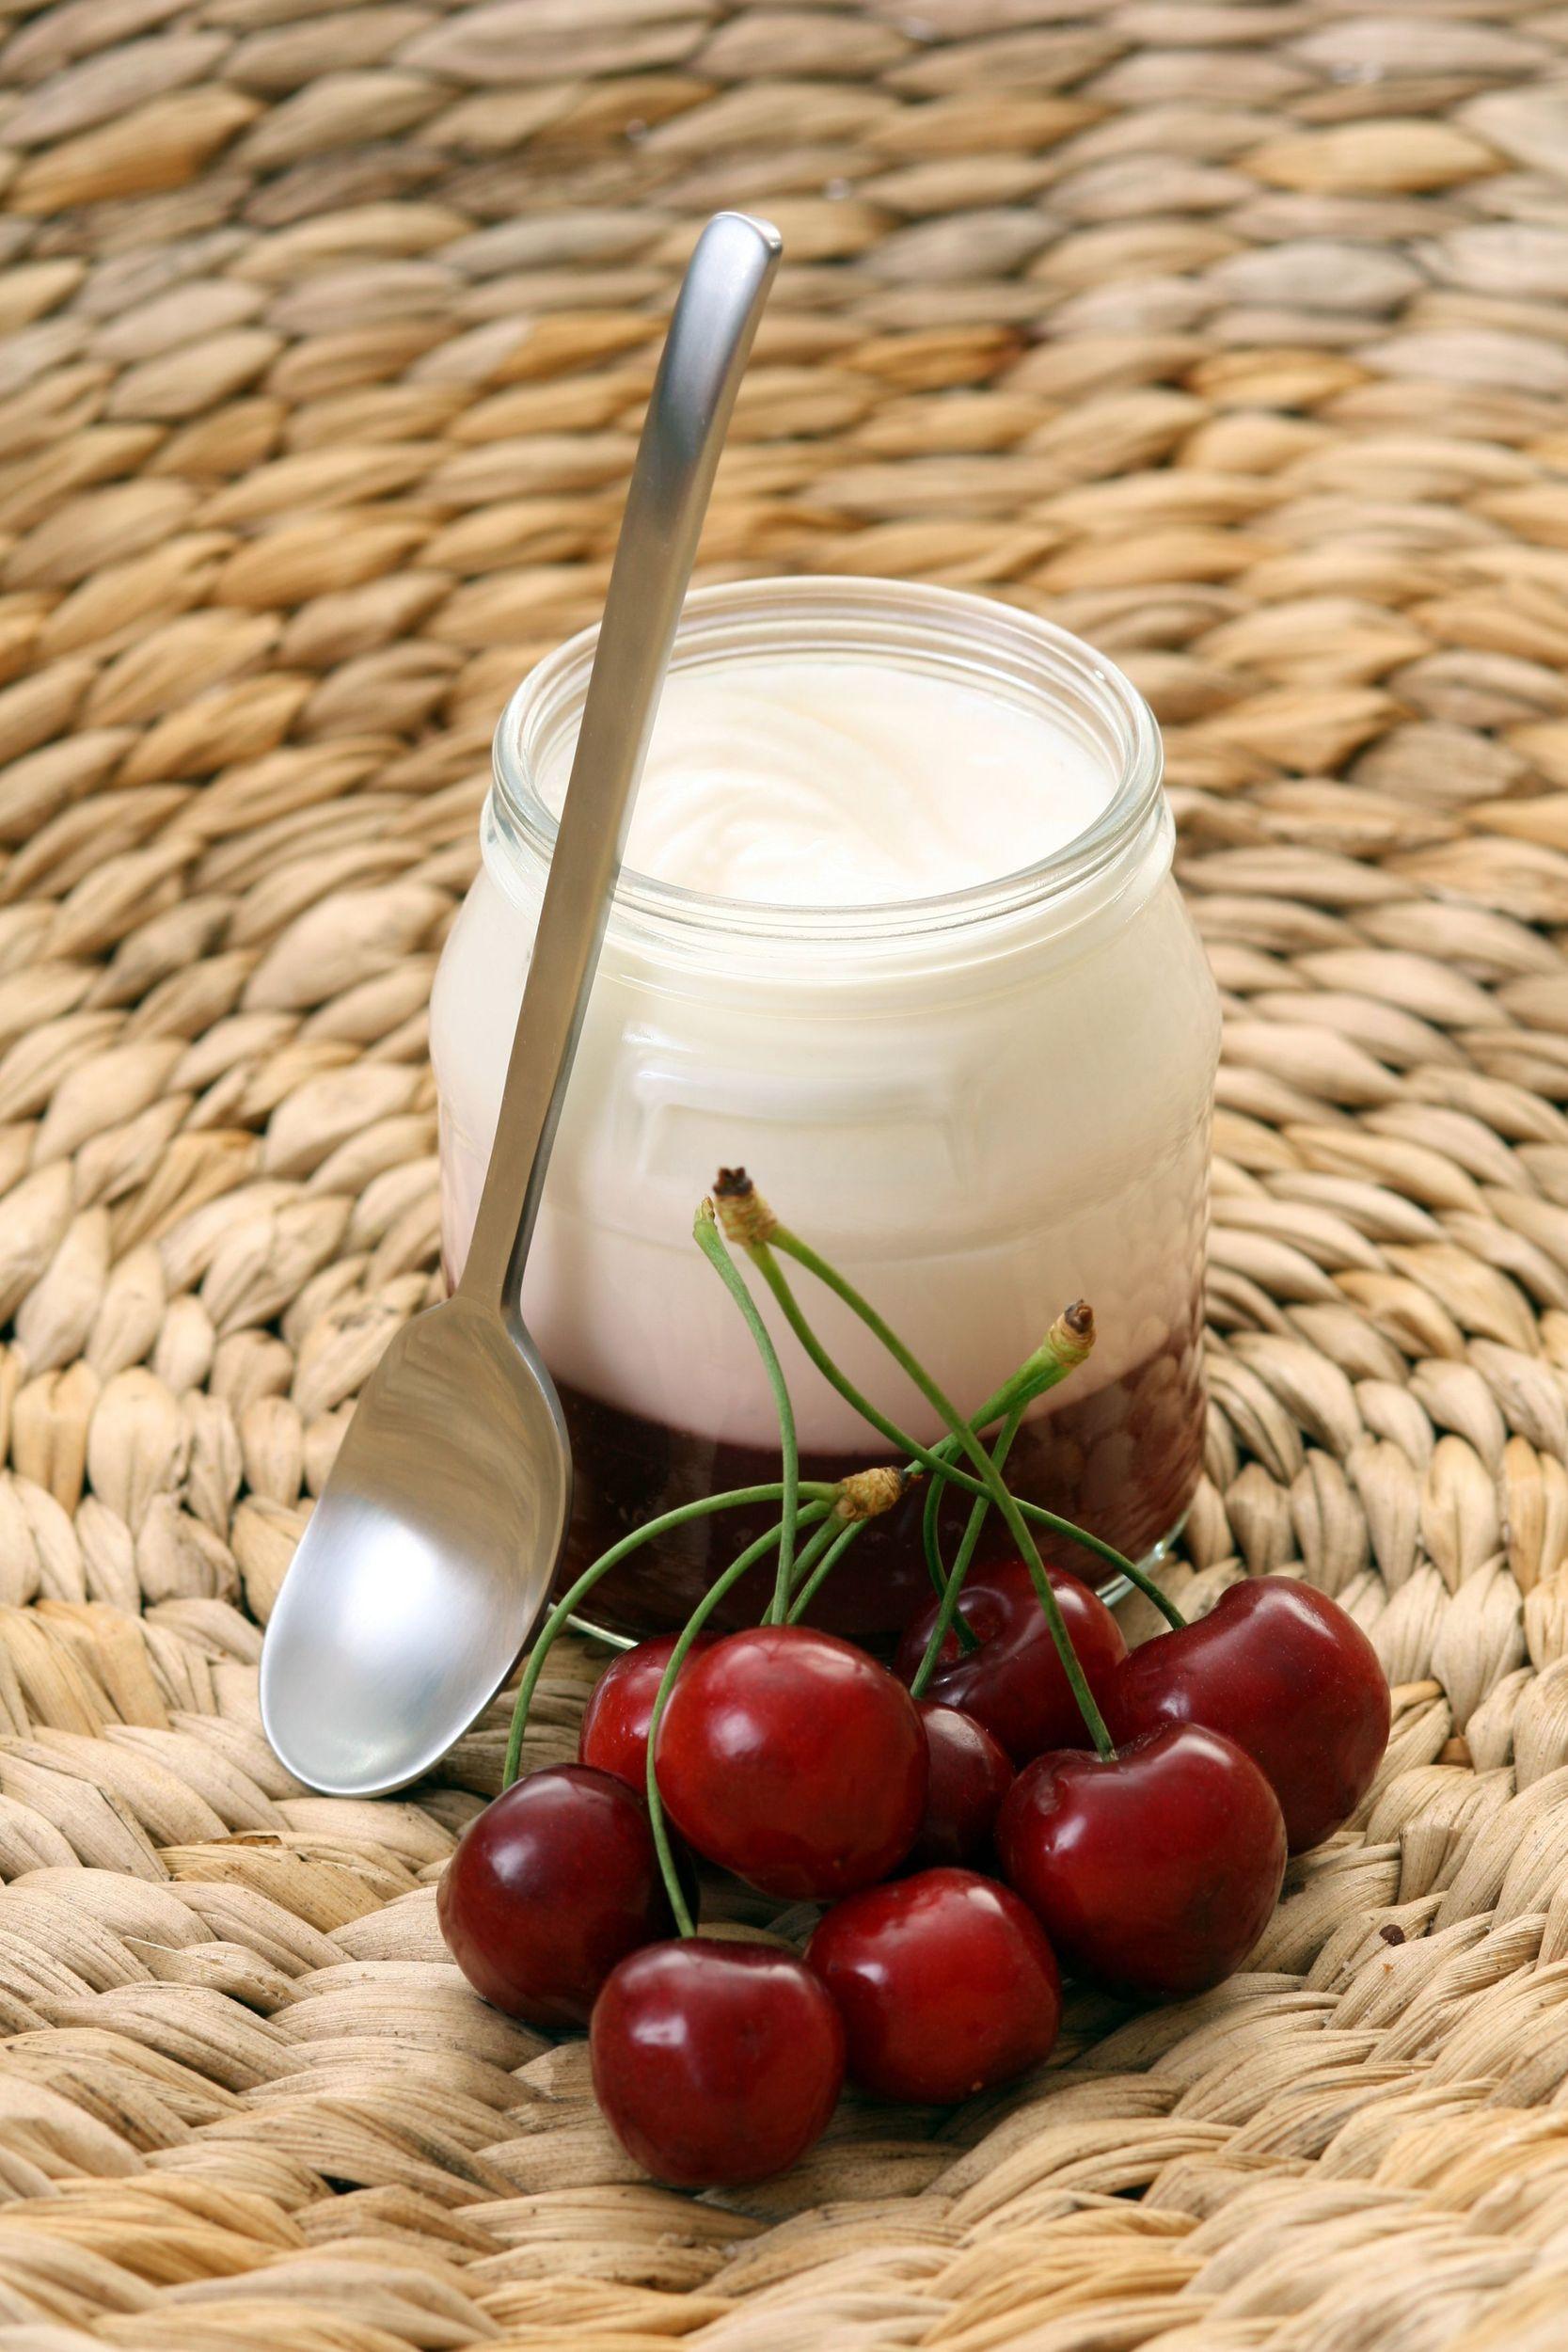 Joghurtbereiter Jogurtmaker NEU inkl. 7 Becher á 200 ml OVP*56164 Bild 2